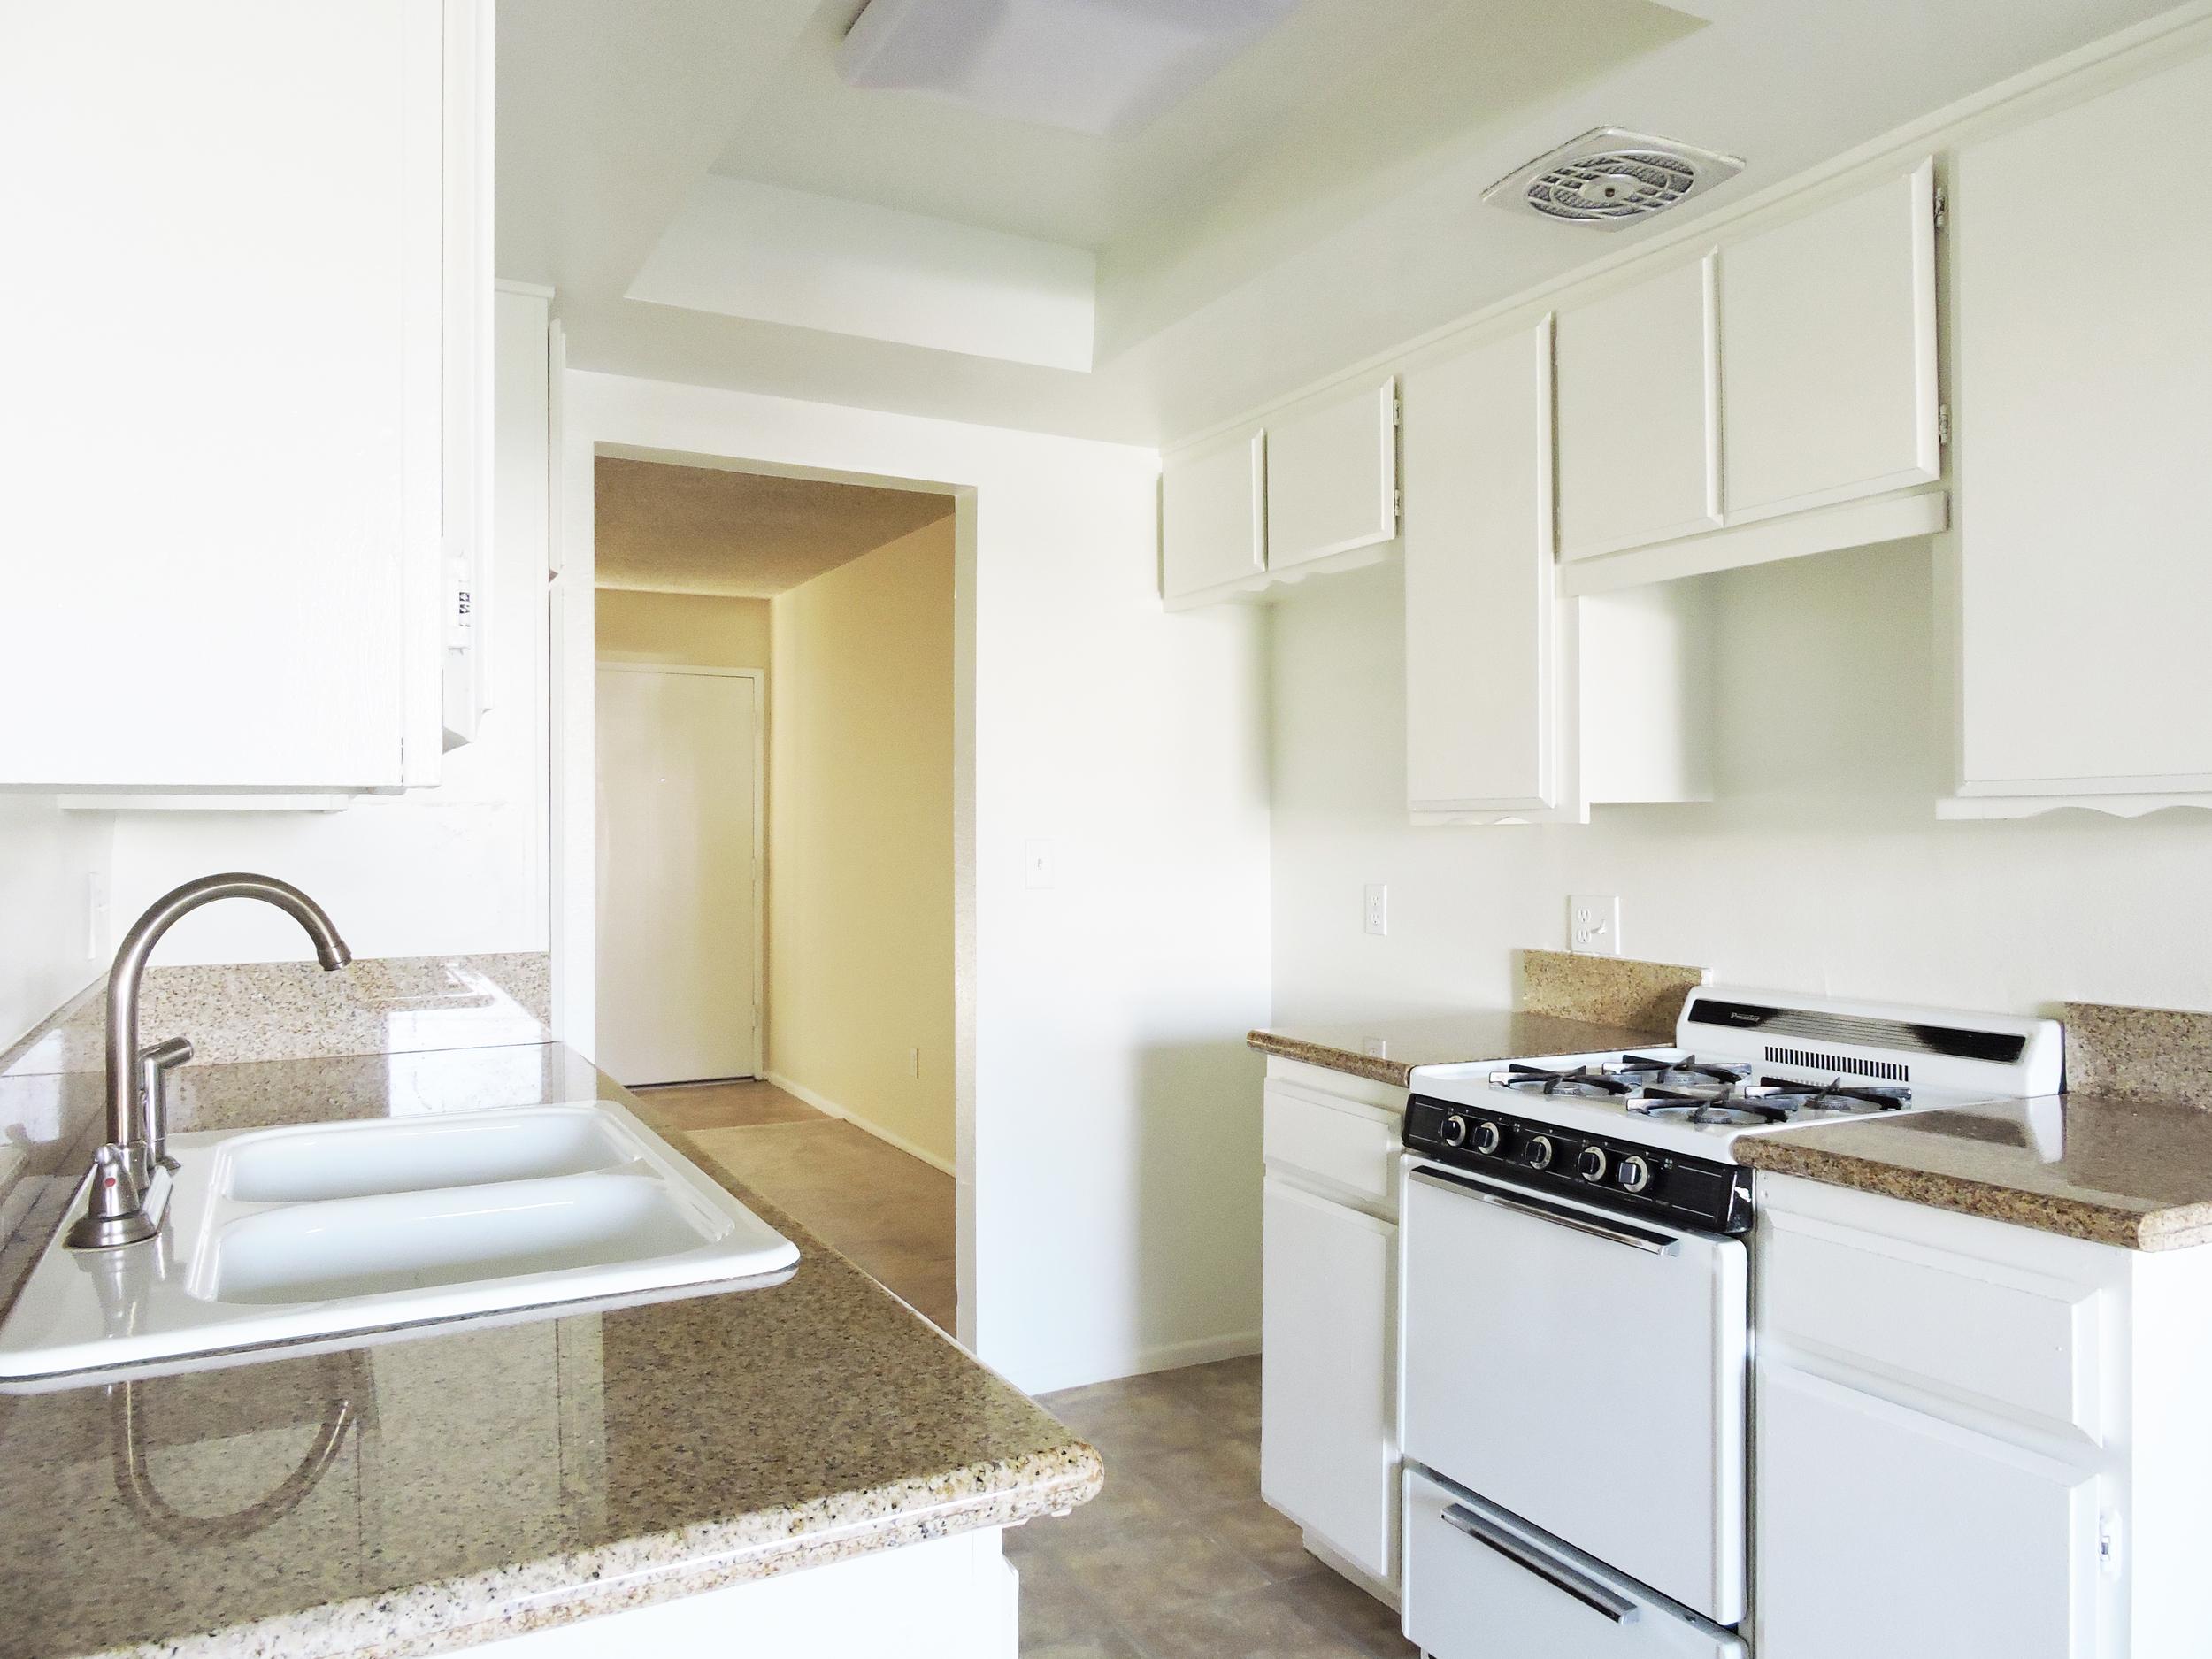 daisy kitchen4.jpg